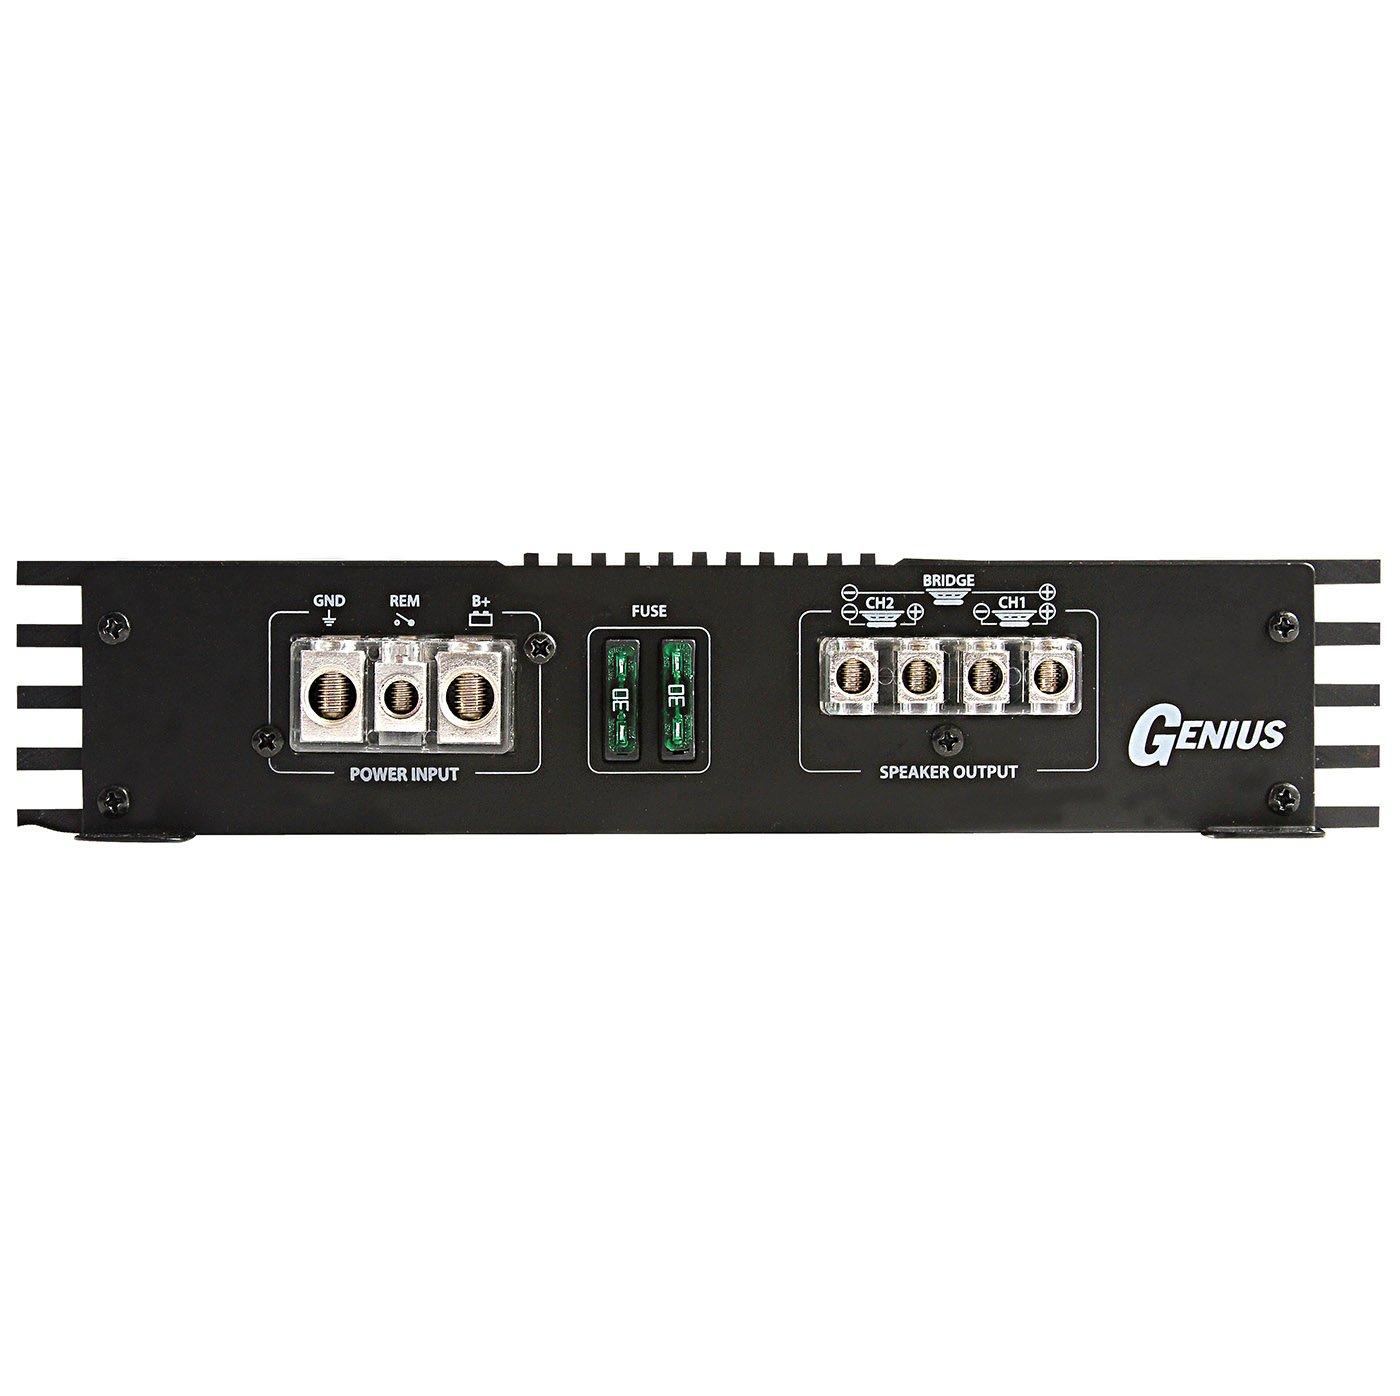 Genius G1-150.2X 600 Watts-Max Car Amplifier Black Frame Professional Class AB Aricasa